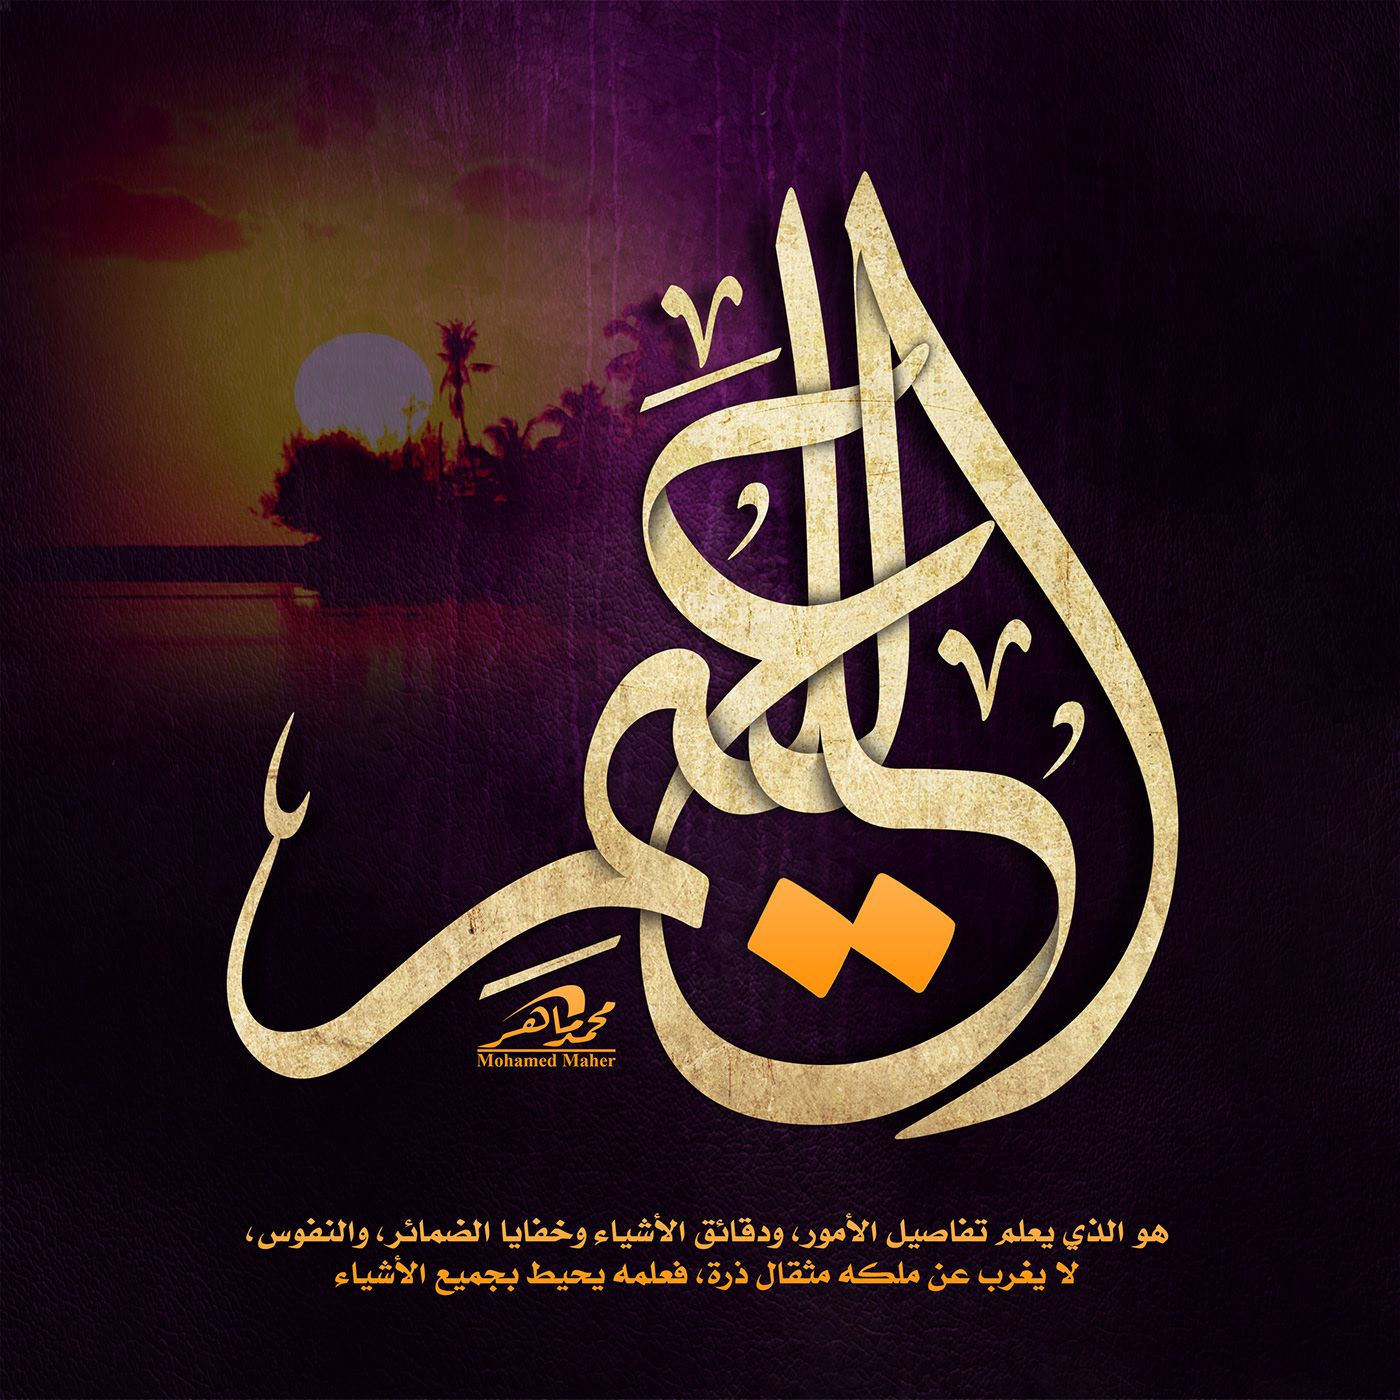 اسماء الله الحسنى مشروع متجدد On Behance Islamic Art Calligraphy Islamic Art Caligraphy Art